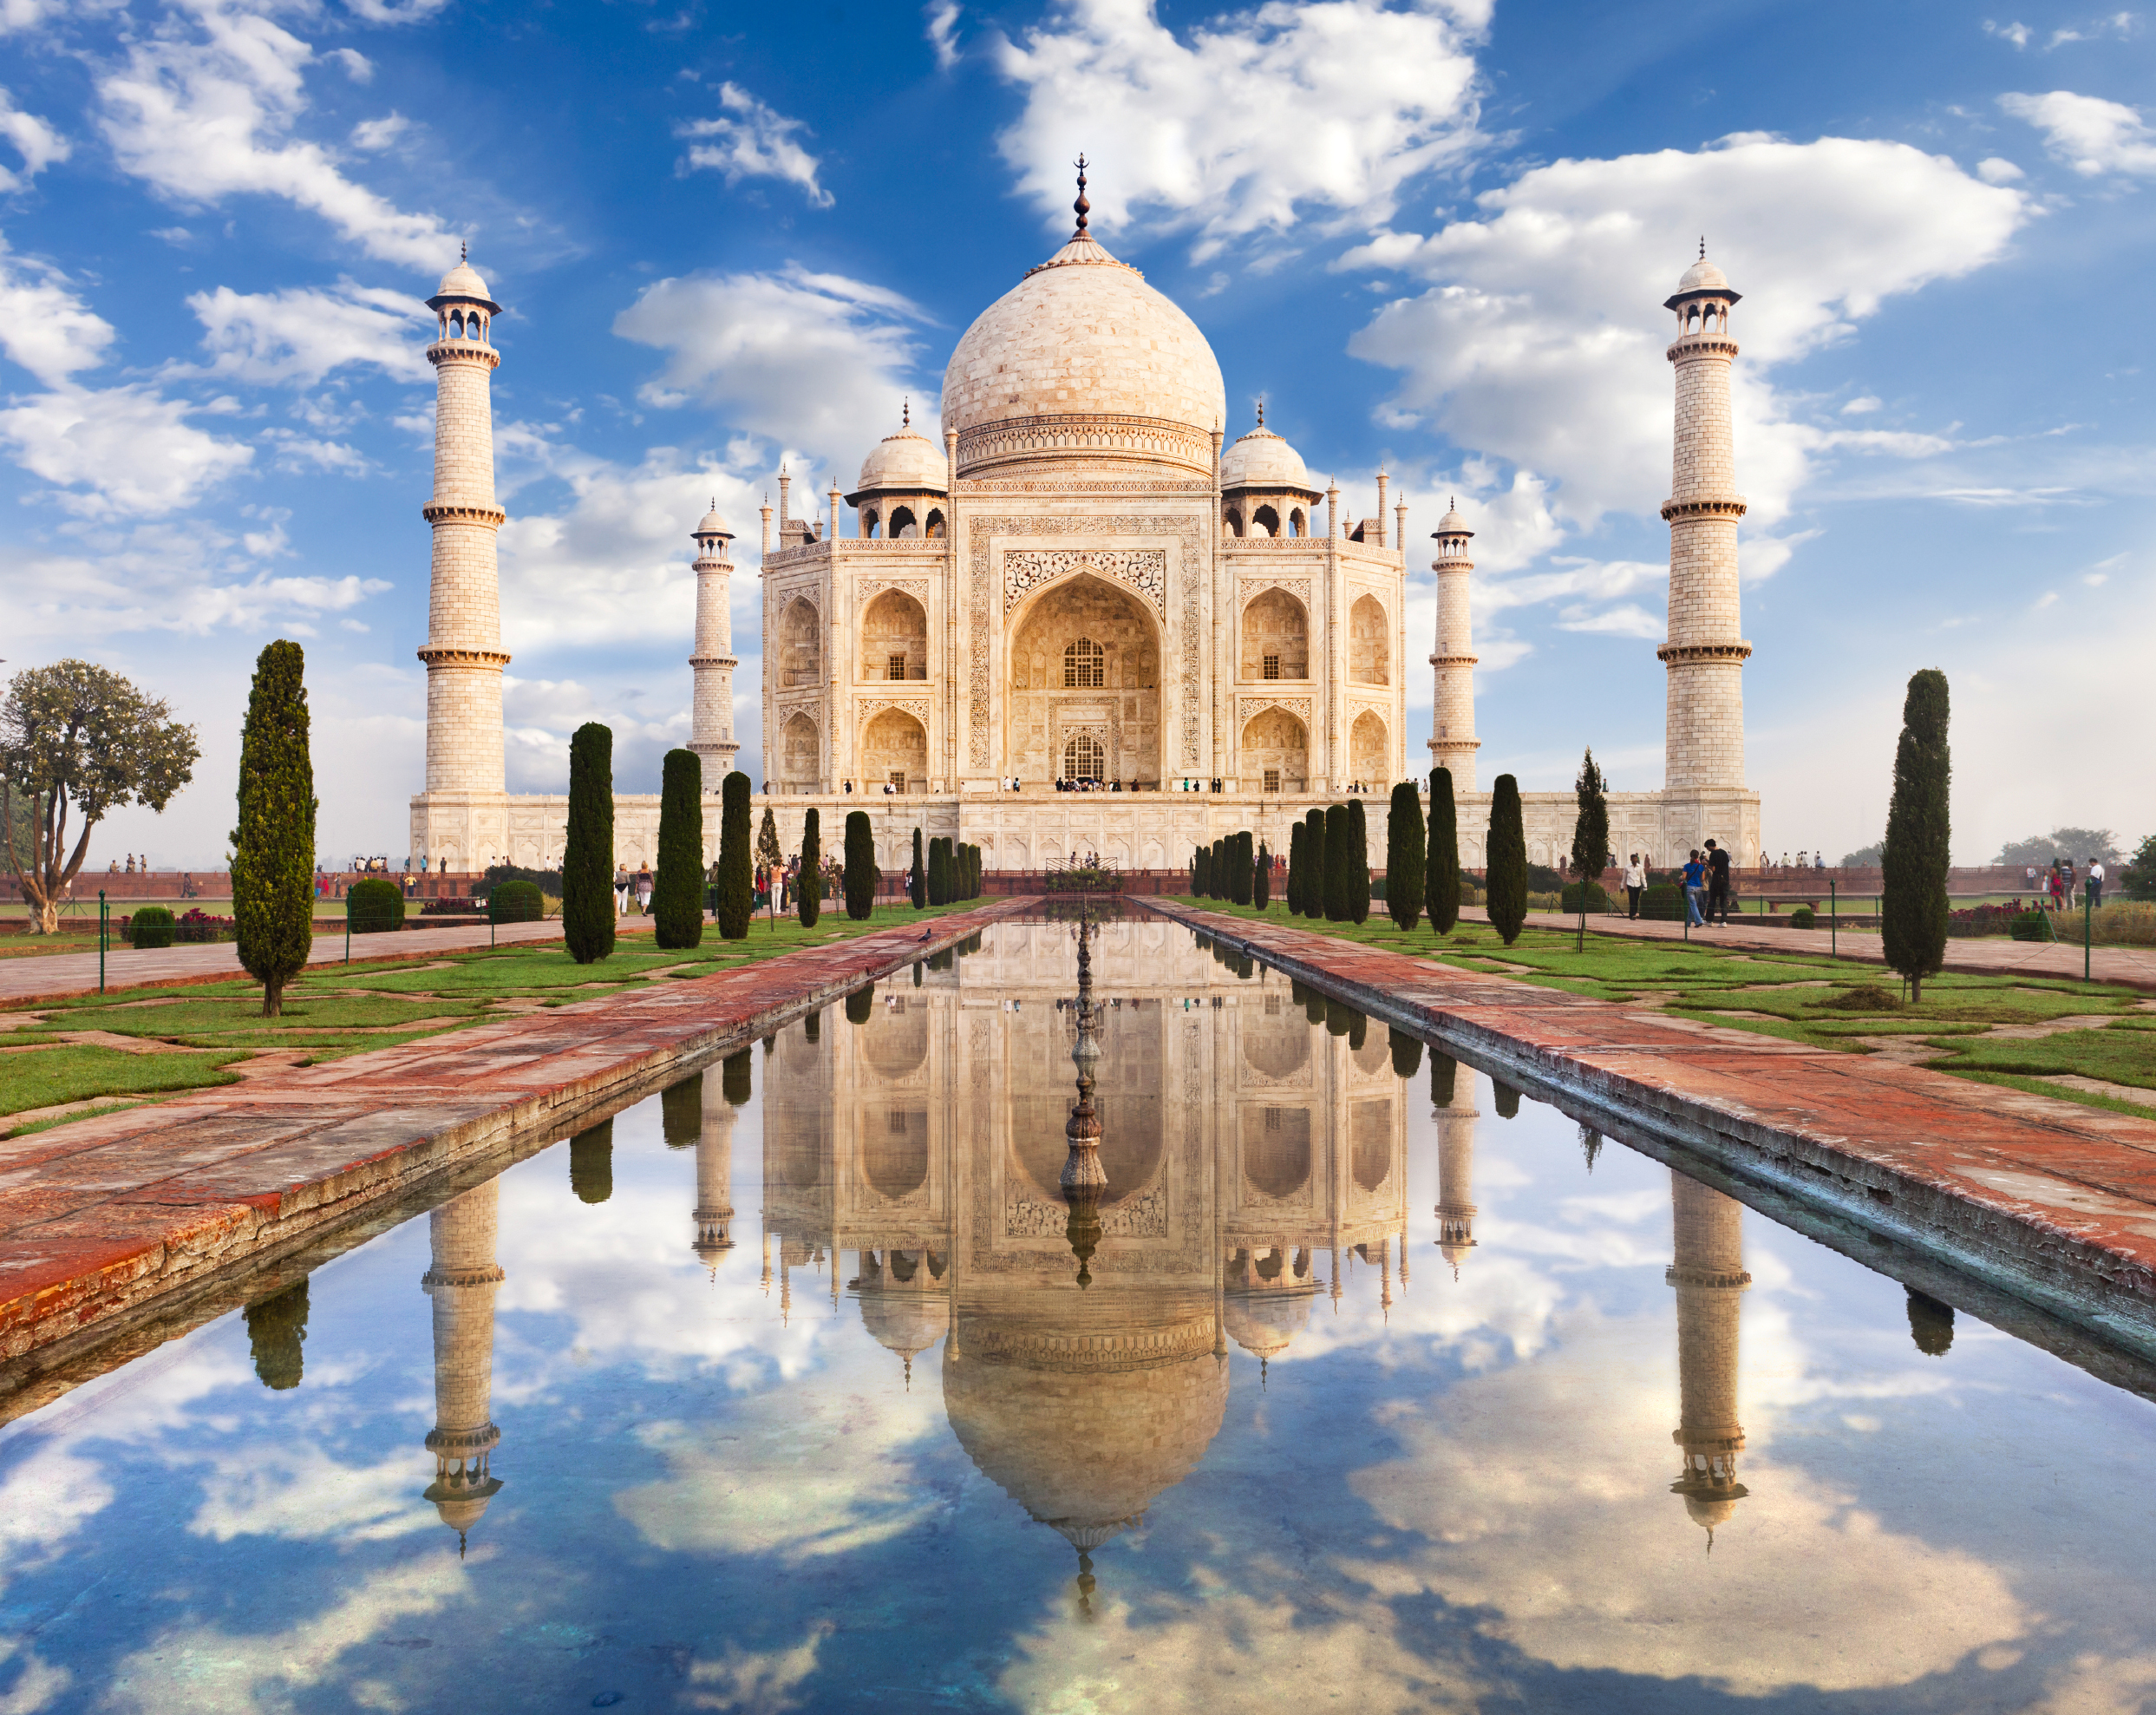 FriendlyPlanet_Taj-Mahal-iStock-18106264 (1)